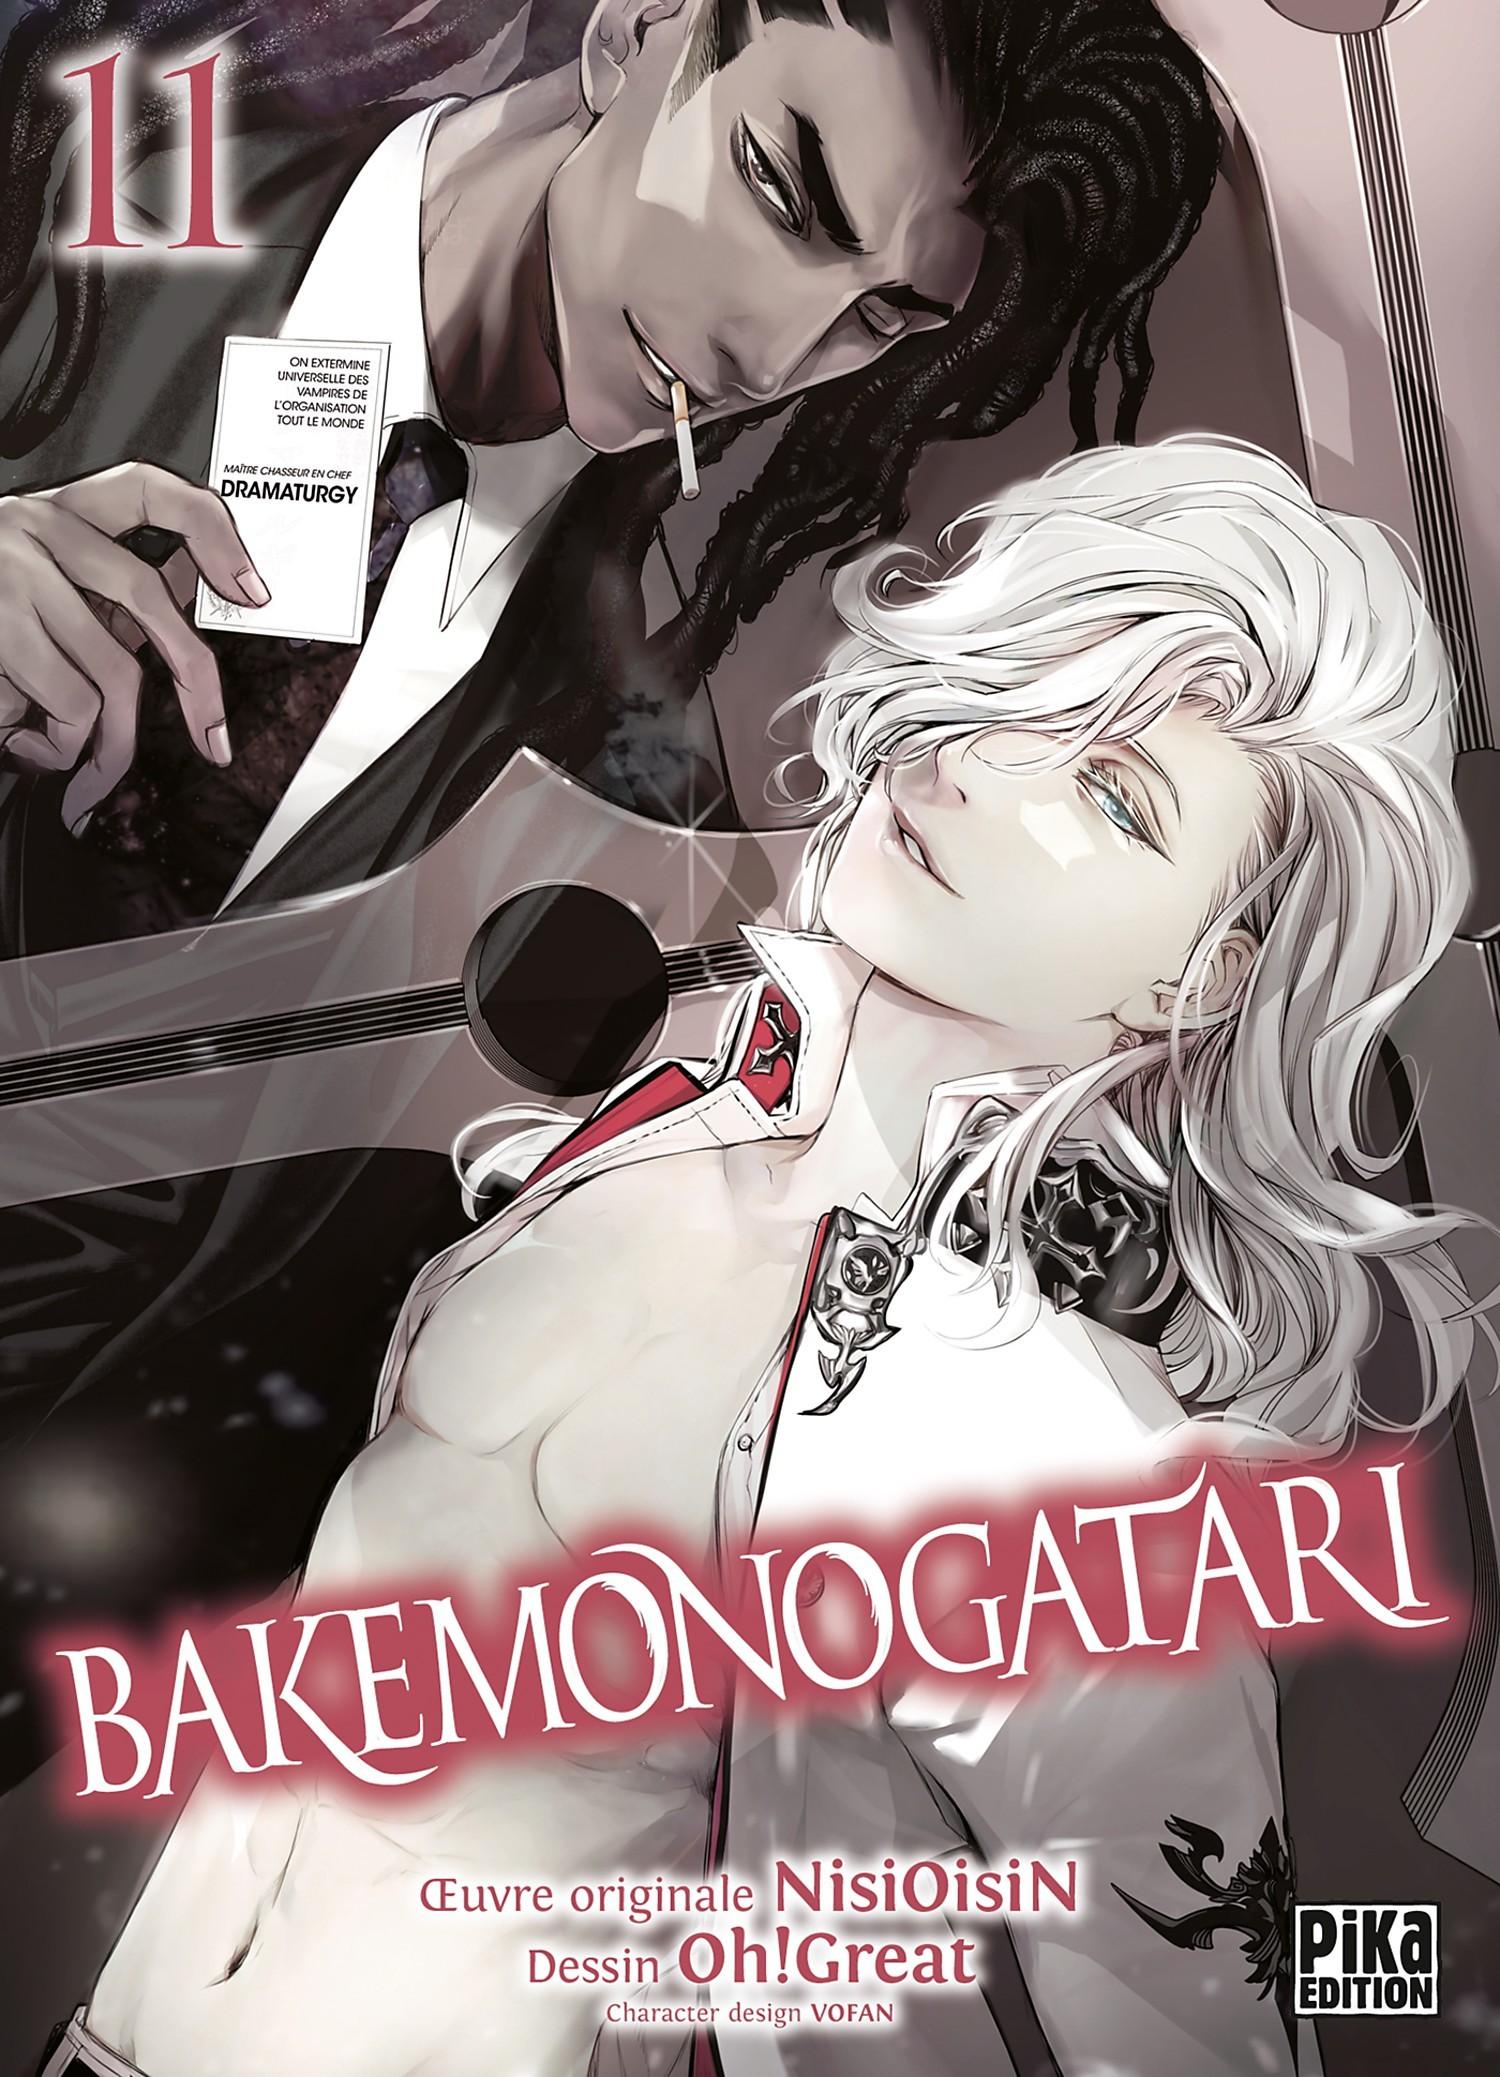 Bakemonogatari 11